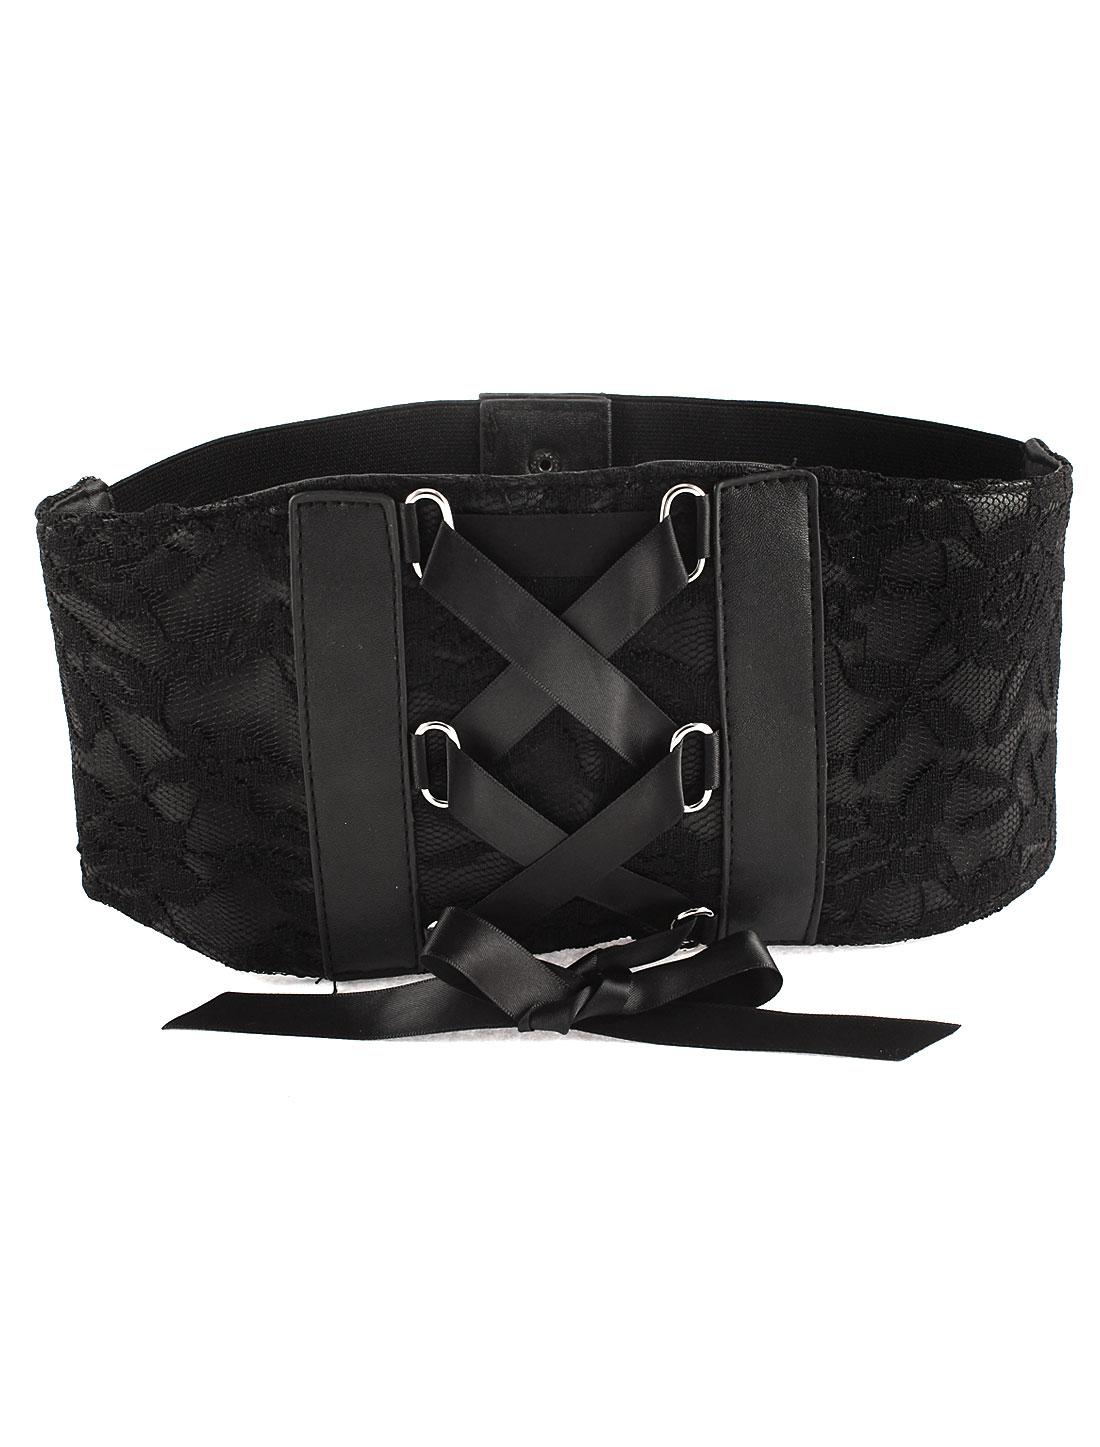 Black Press Stud Button Lace Stretchy Waist Belt for Lady